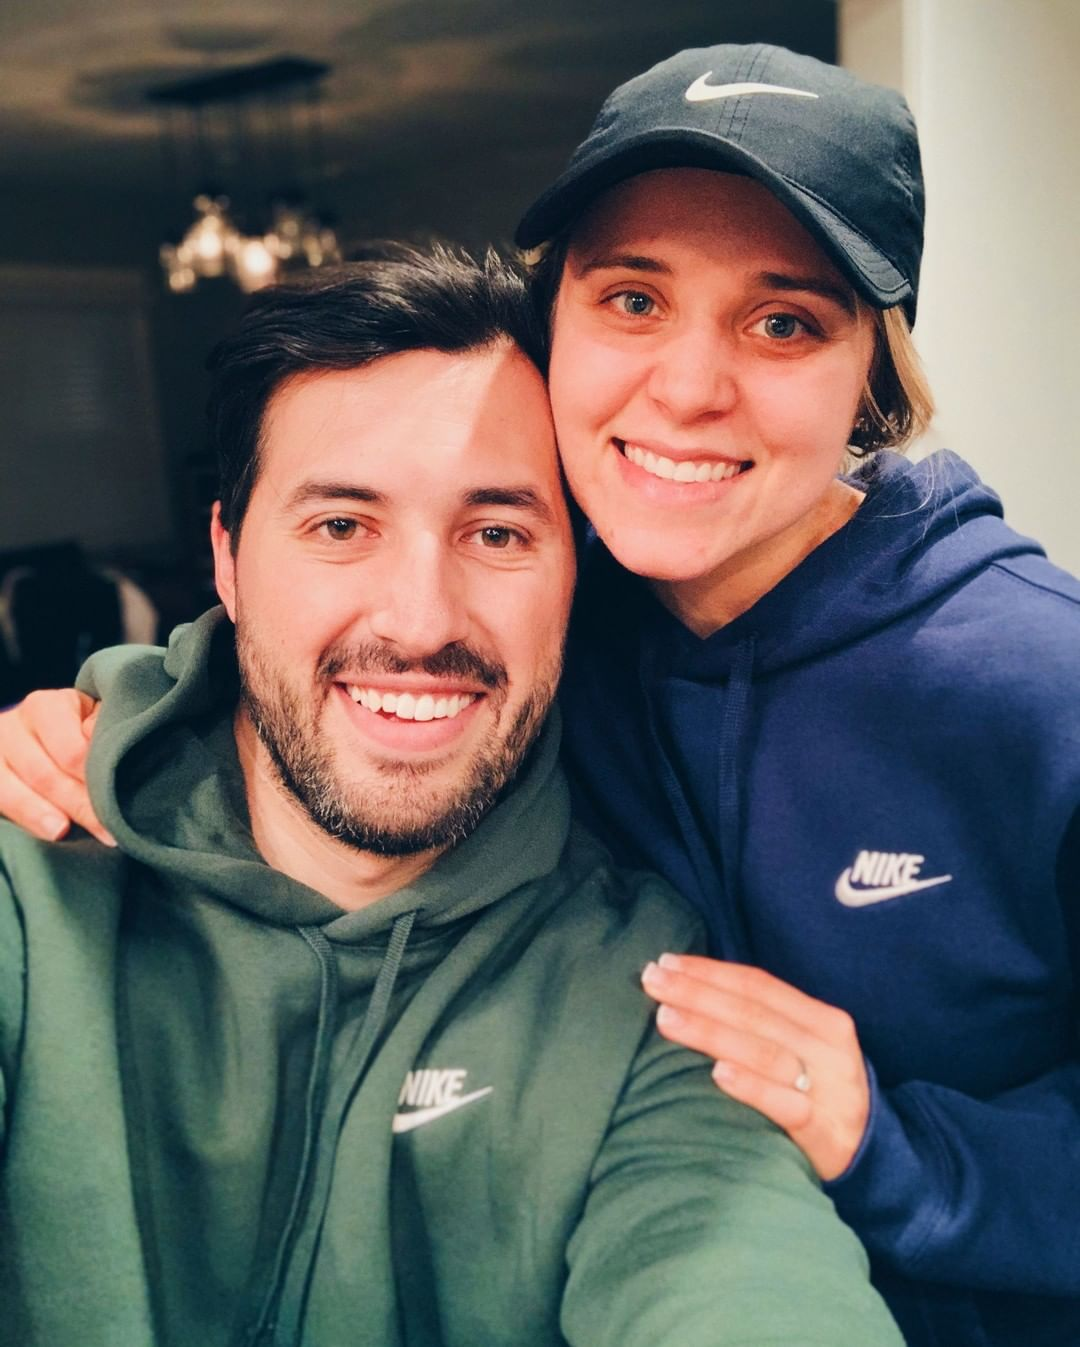 Jinger and Jeremy Vuolo Snap Cozy Selfie In Matching Sweatshirts